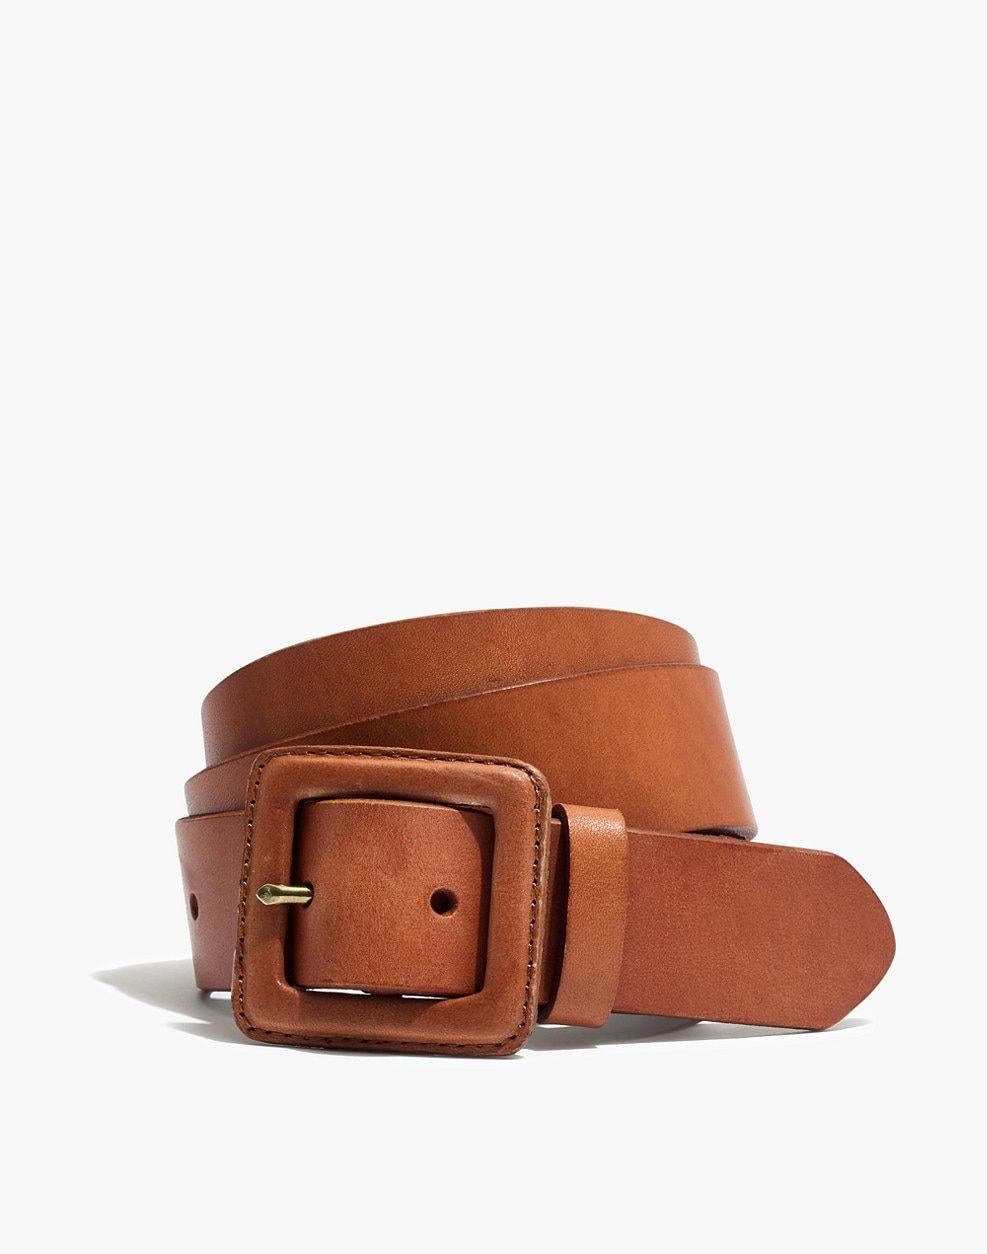 19a11c4582c Leather Covered Buckle Belt | 2444444444 | Belt buckles, Belt ...